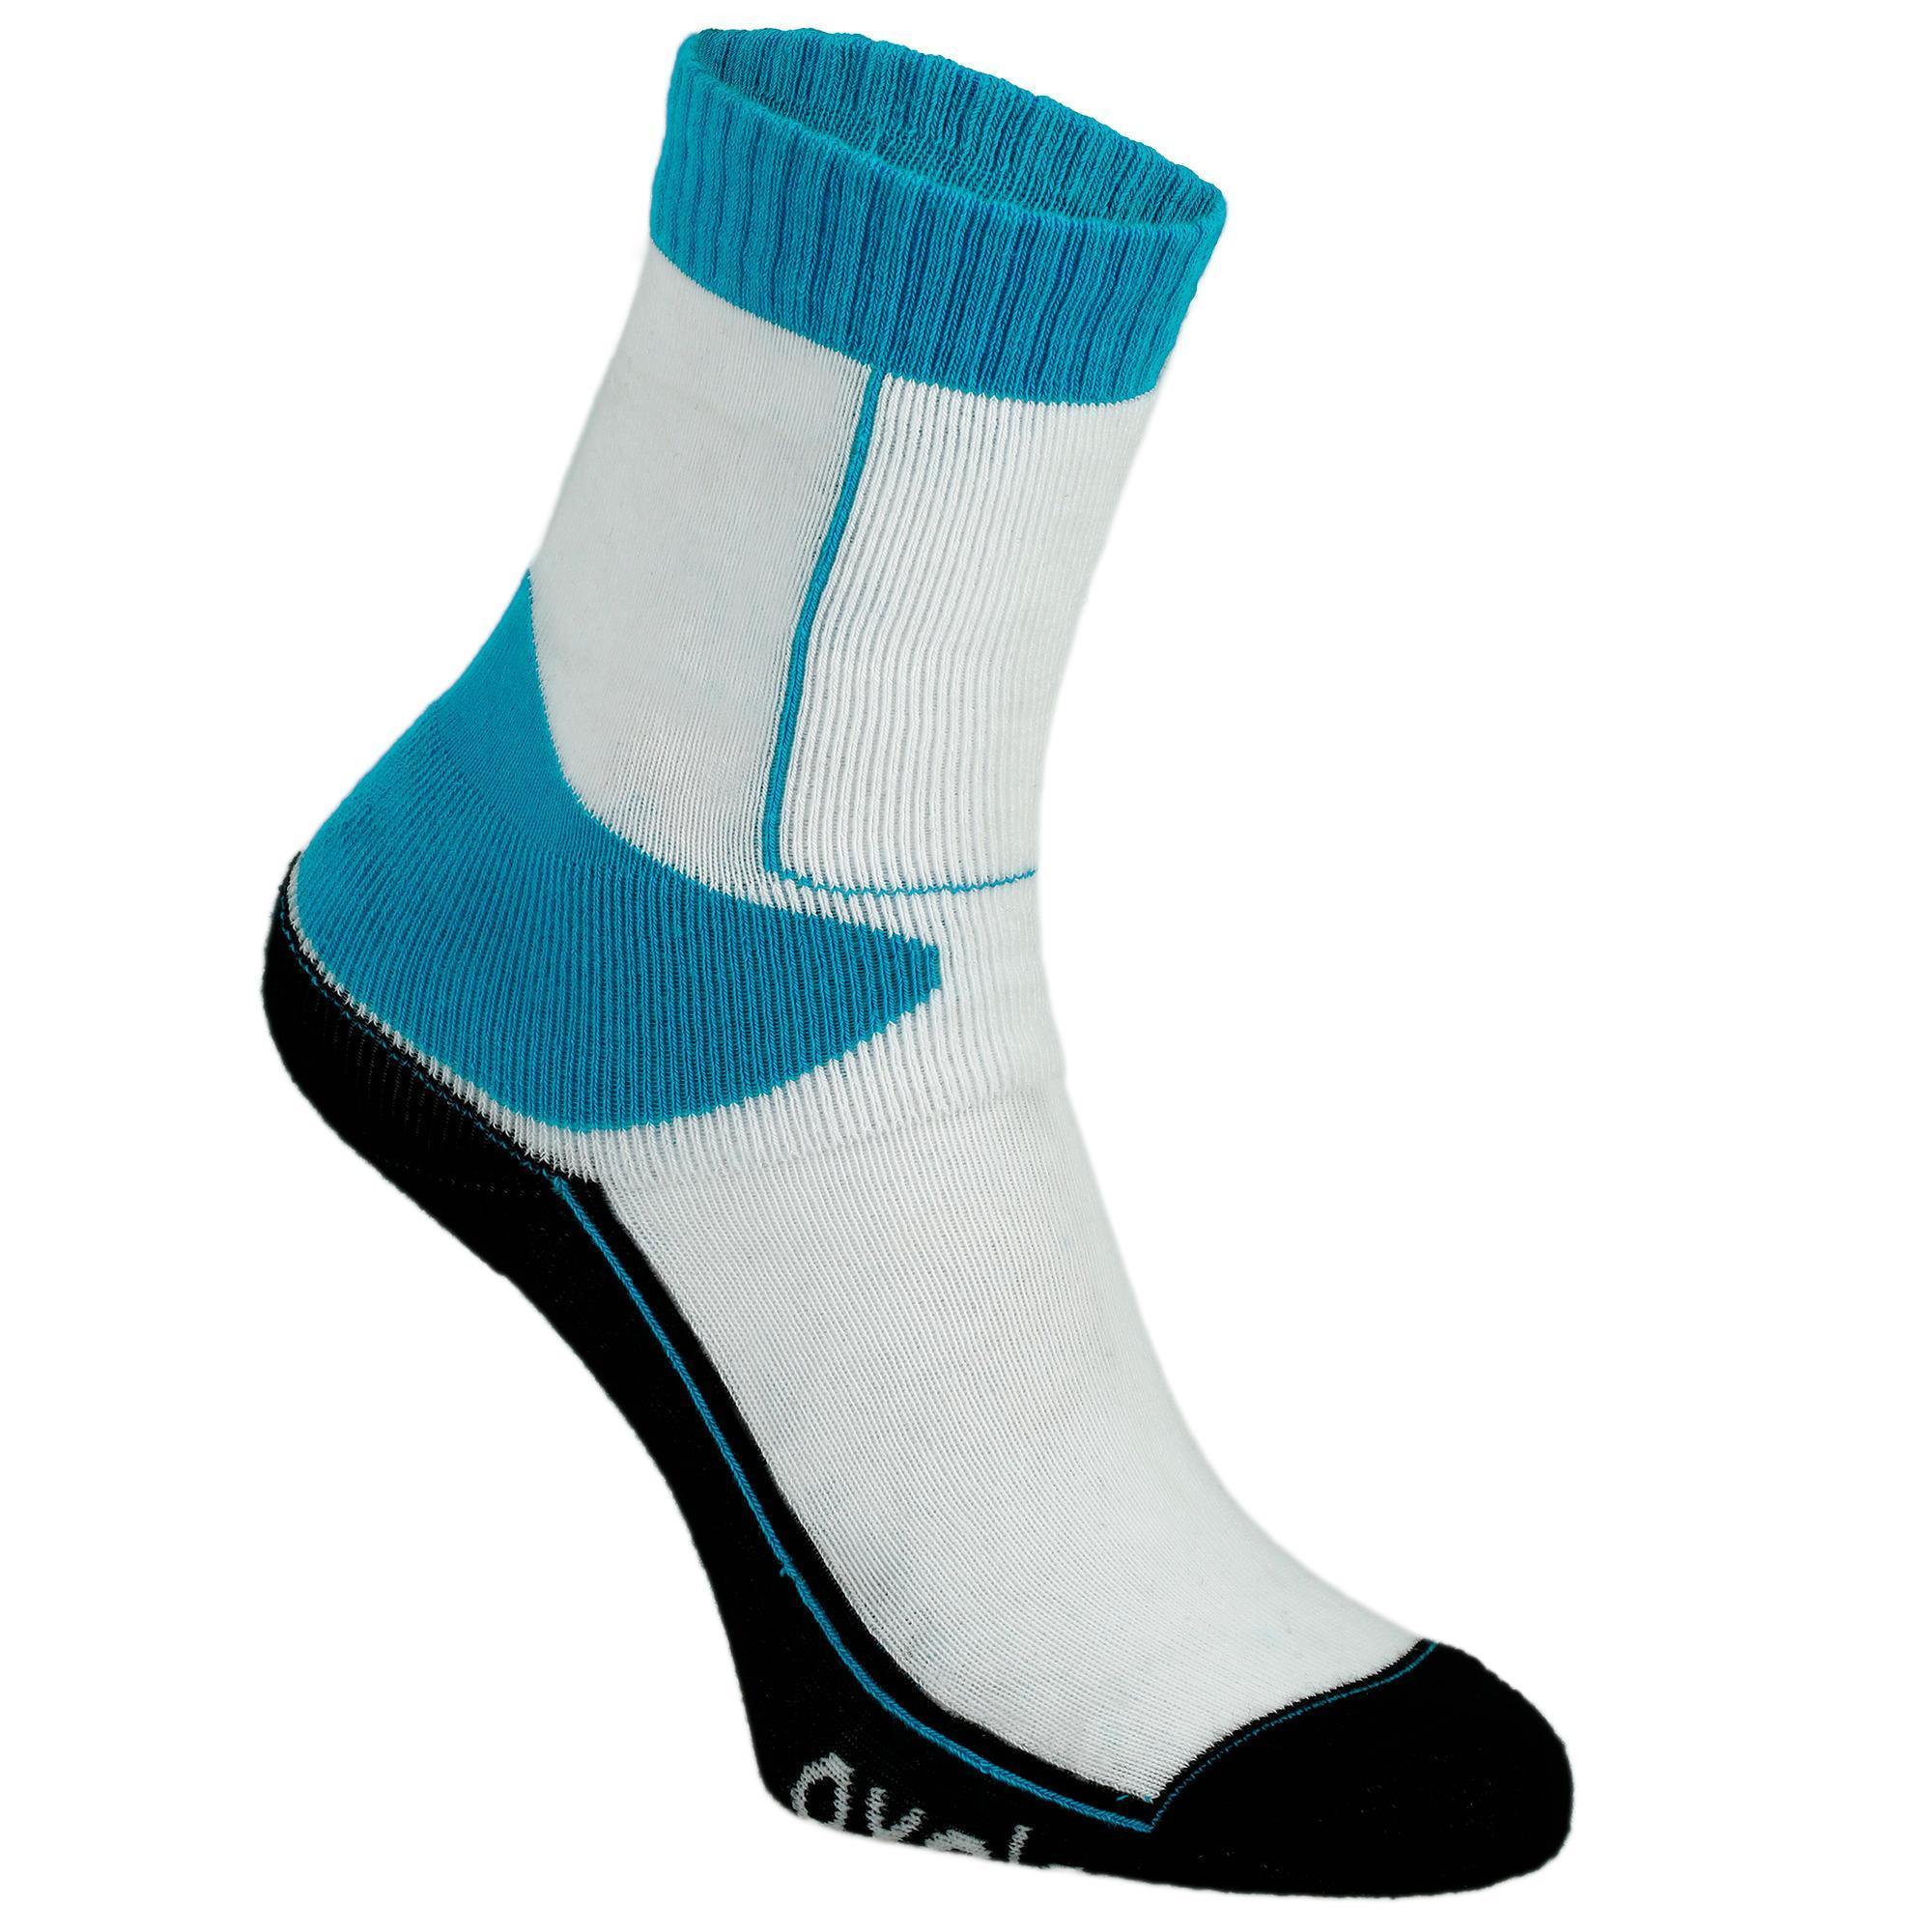 Jungen,Kinder Skater-Socken Play Kinder blau/weiß | 03583788317234